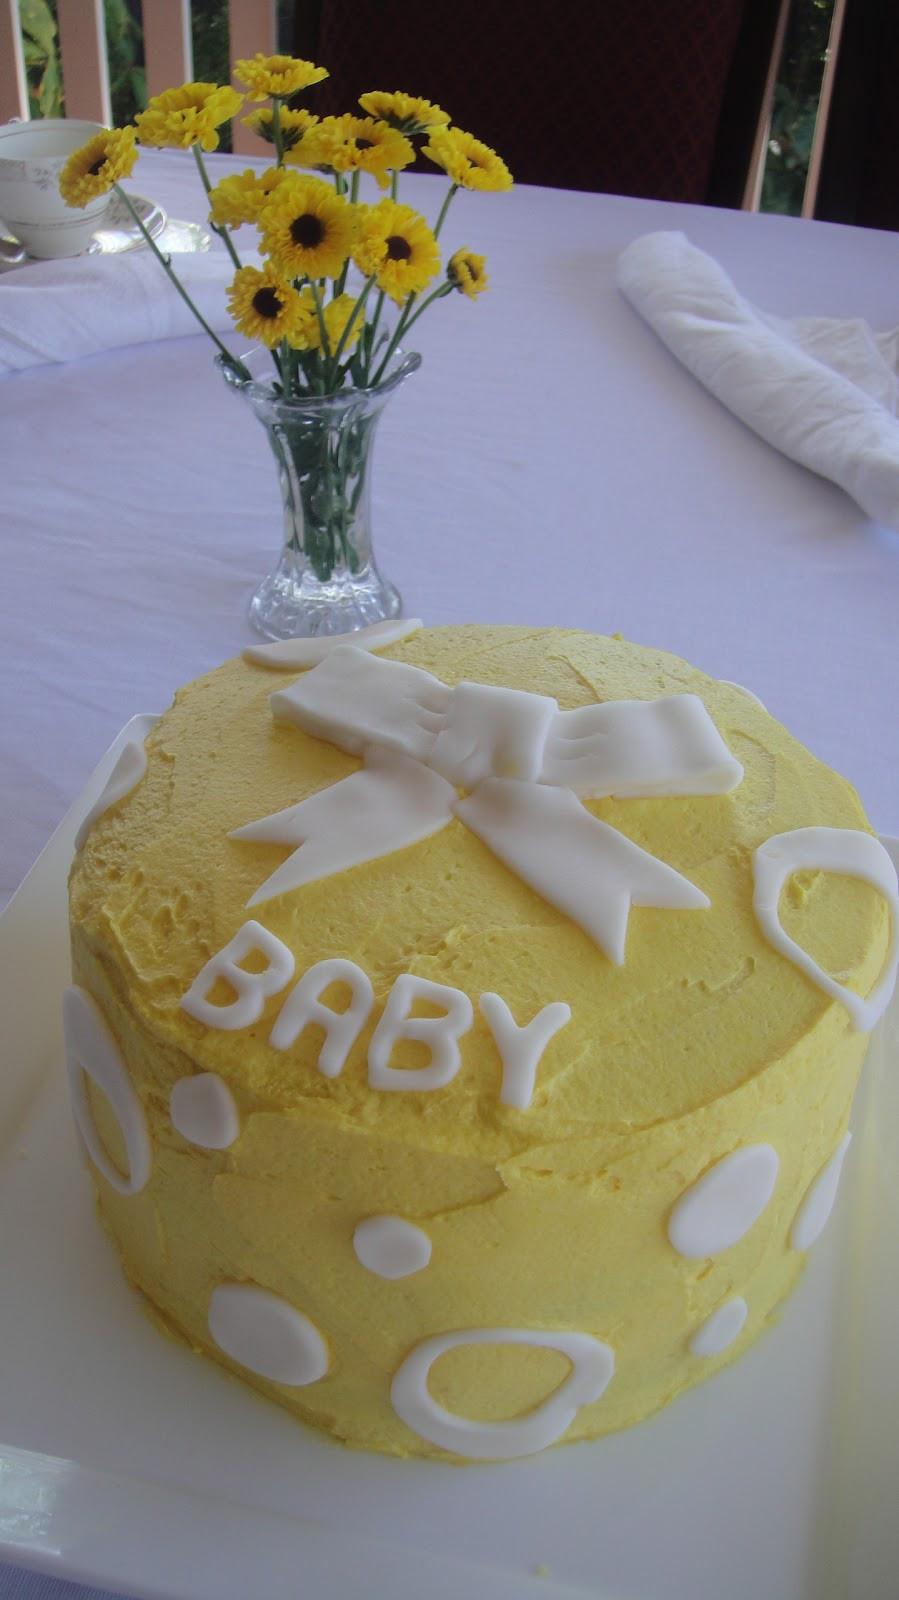 Baby Shower Cake Recipe  Mums in the Kitchen Baby Shower Cake